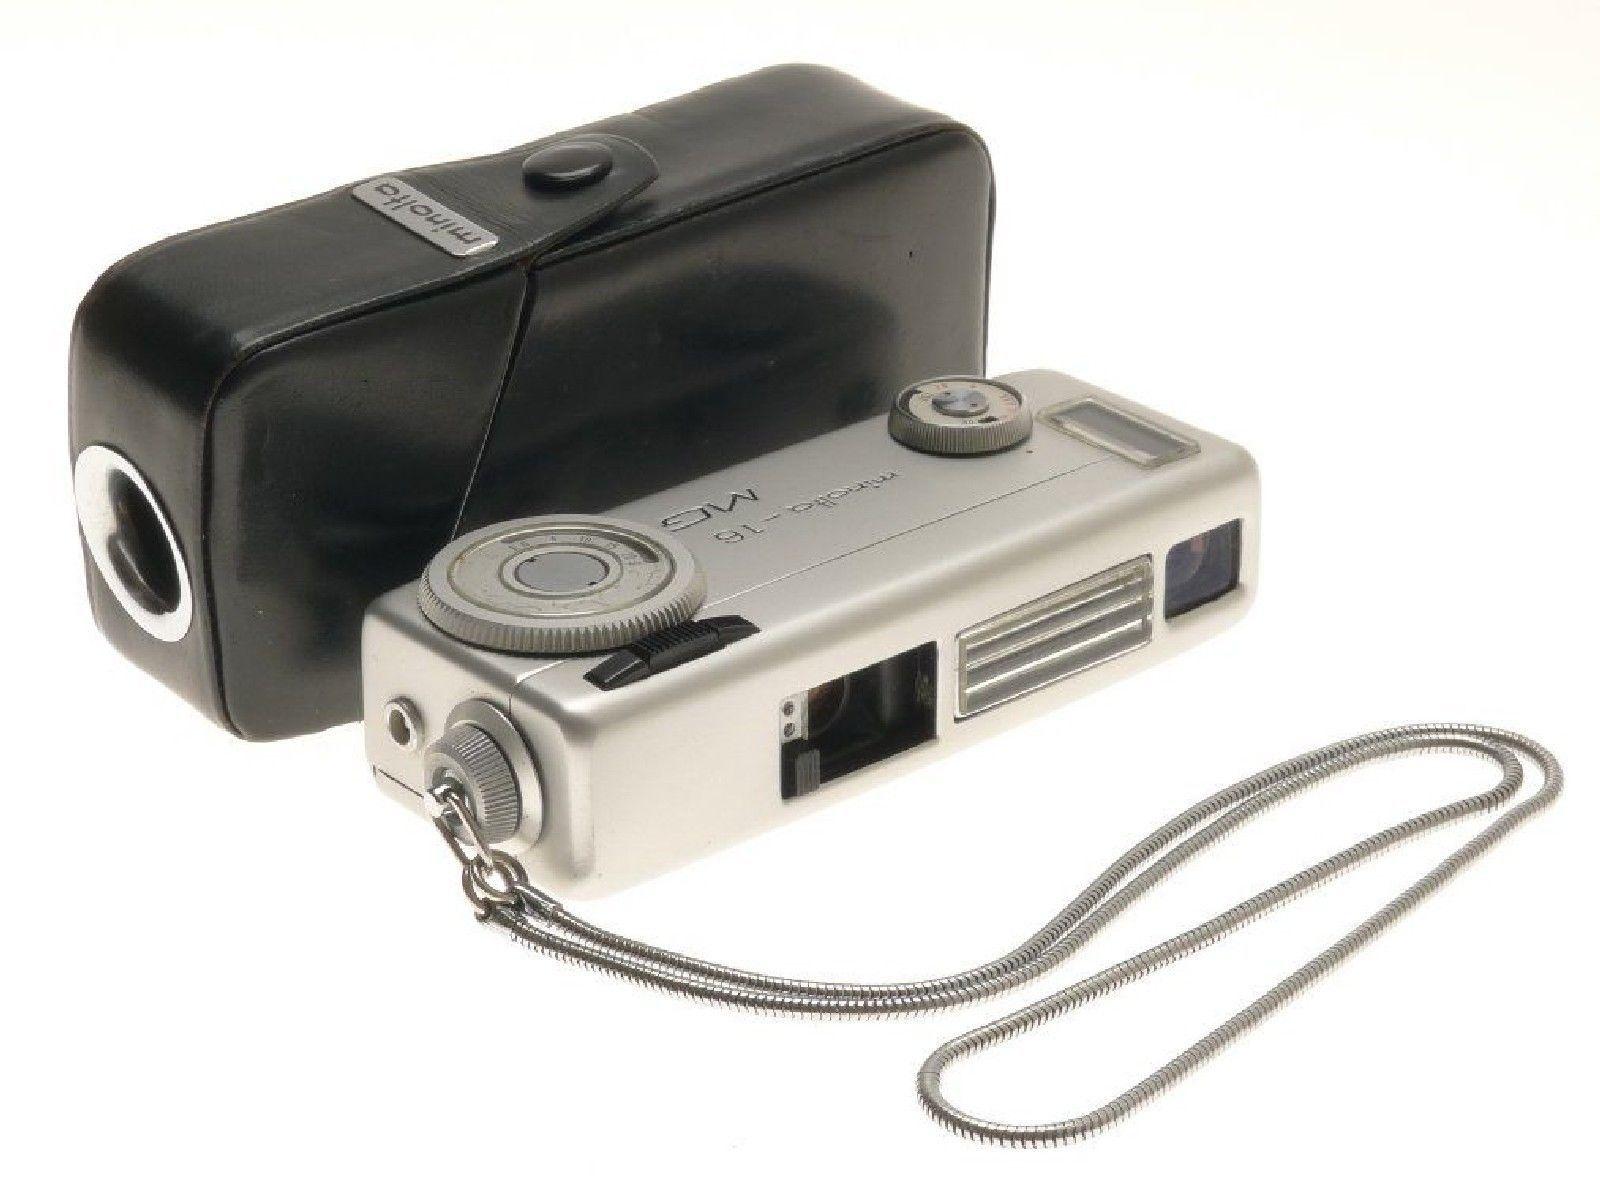 Minolta 16 Mg Subminiature Spy Camera Original Case Vintage Untested Sold As Is Ebay